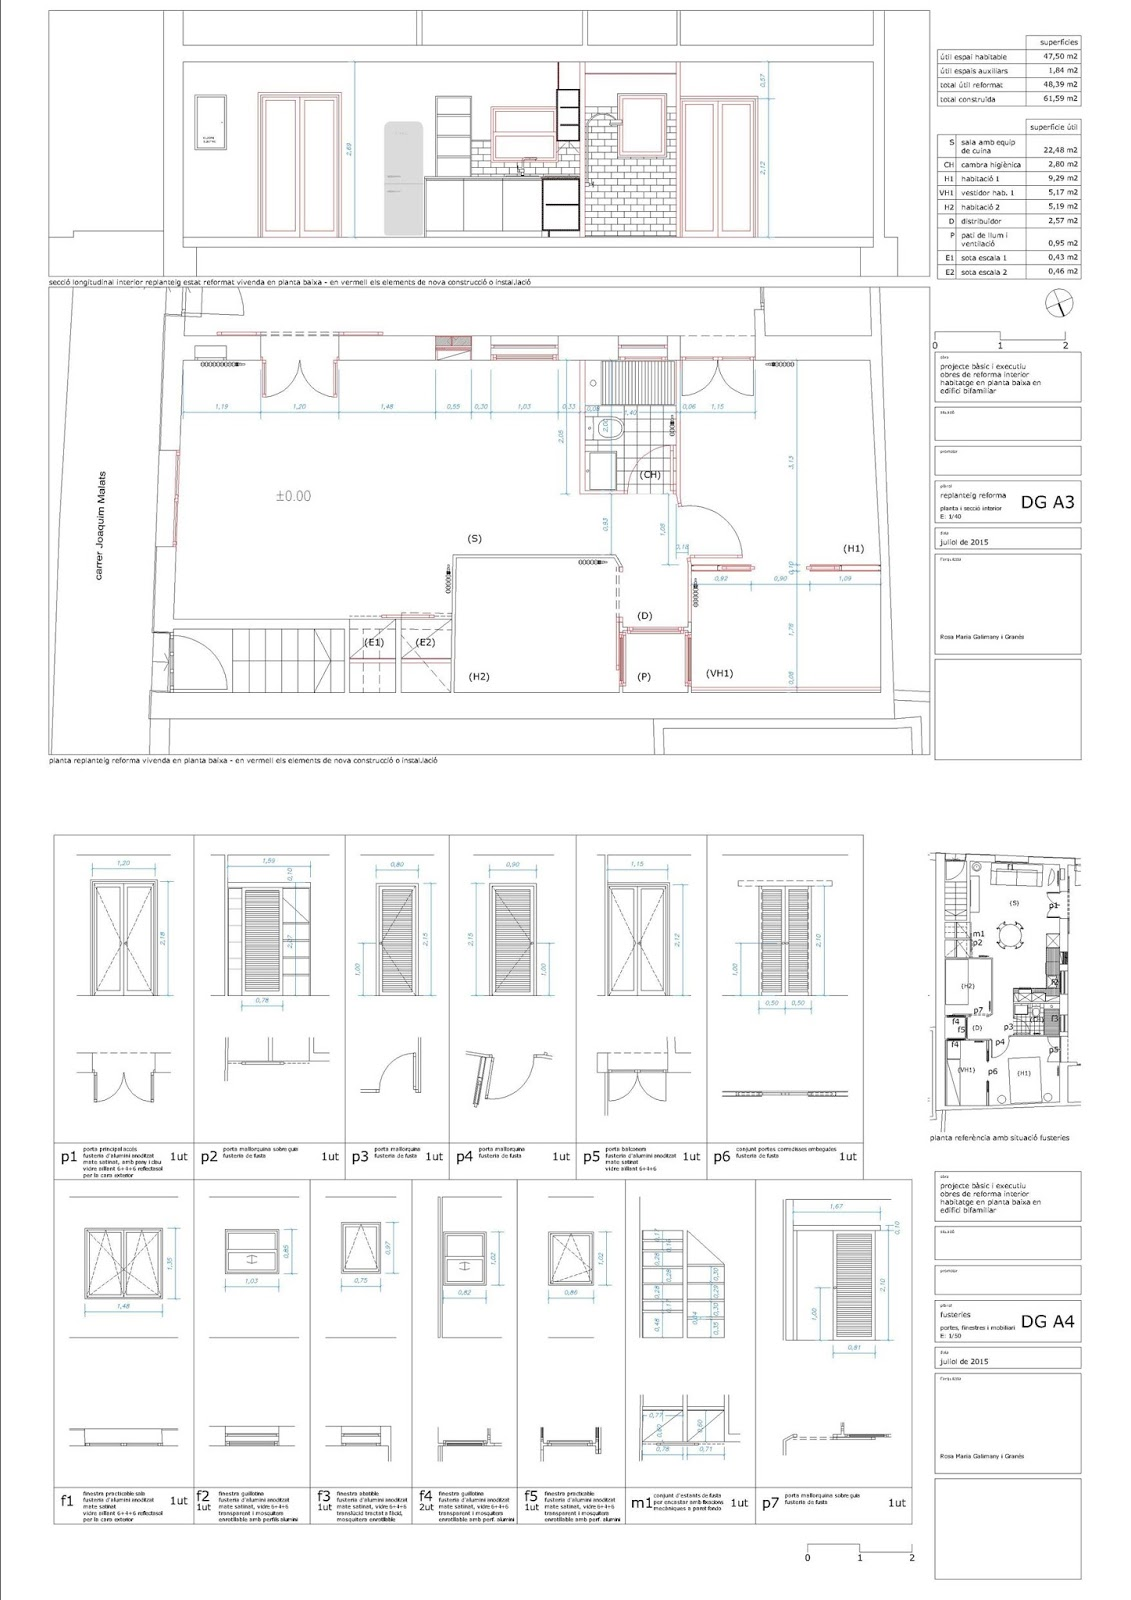 Arquitectura rosamariagal despacho de arquitectura en - Estudios de arquitectura en barcelona ...